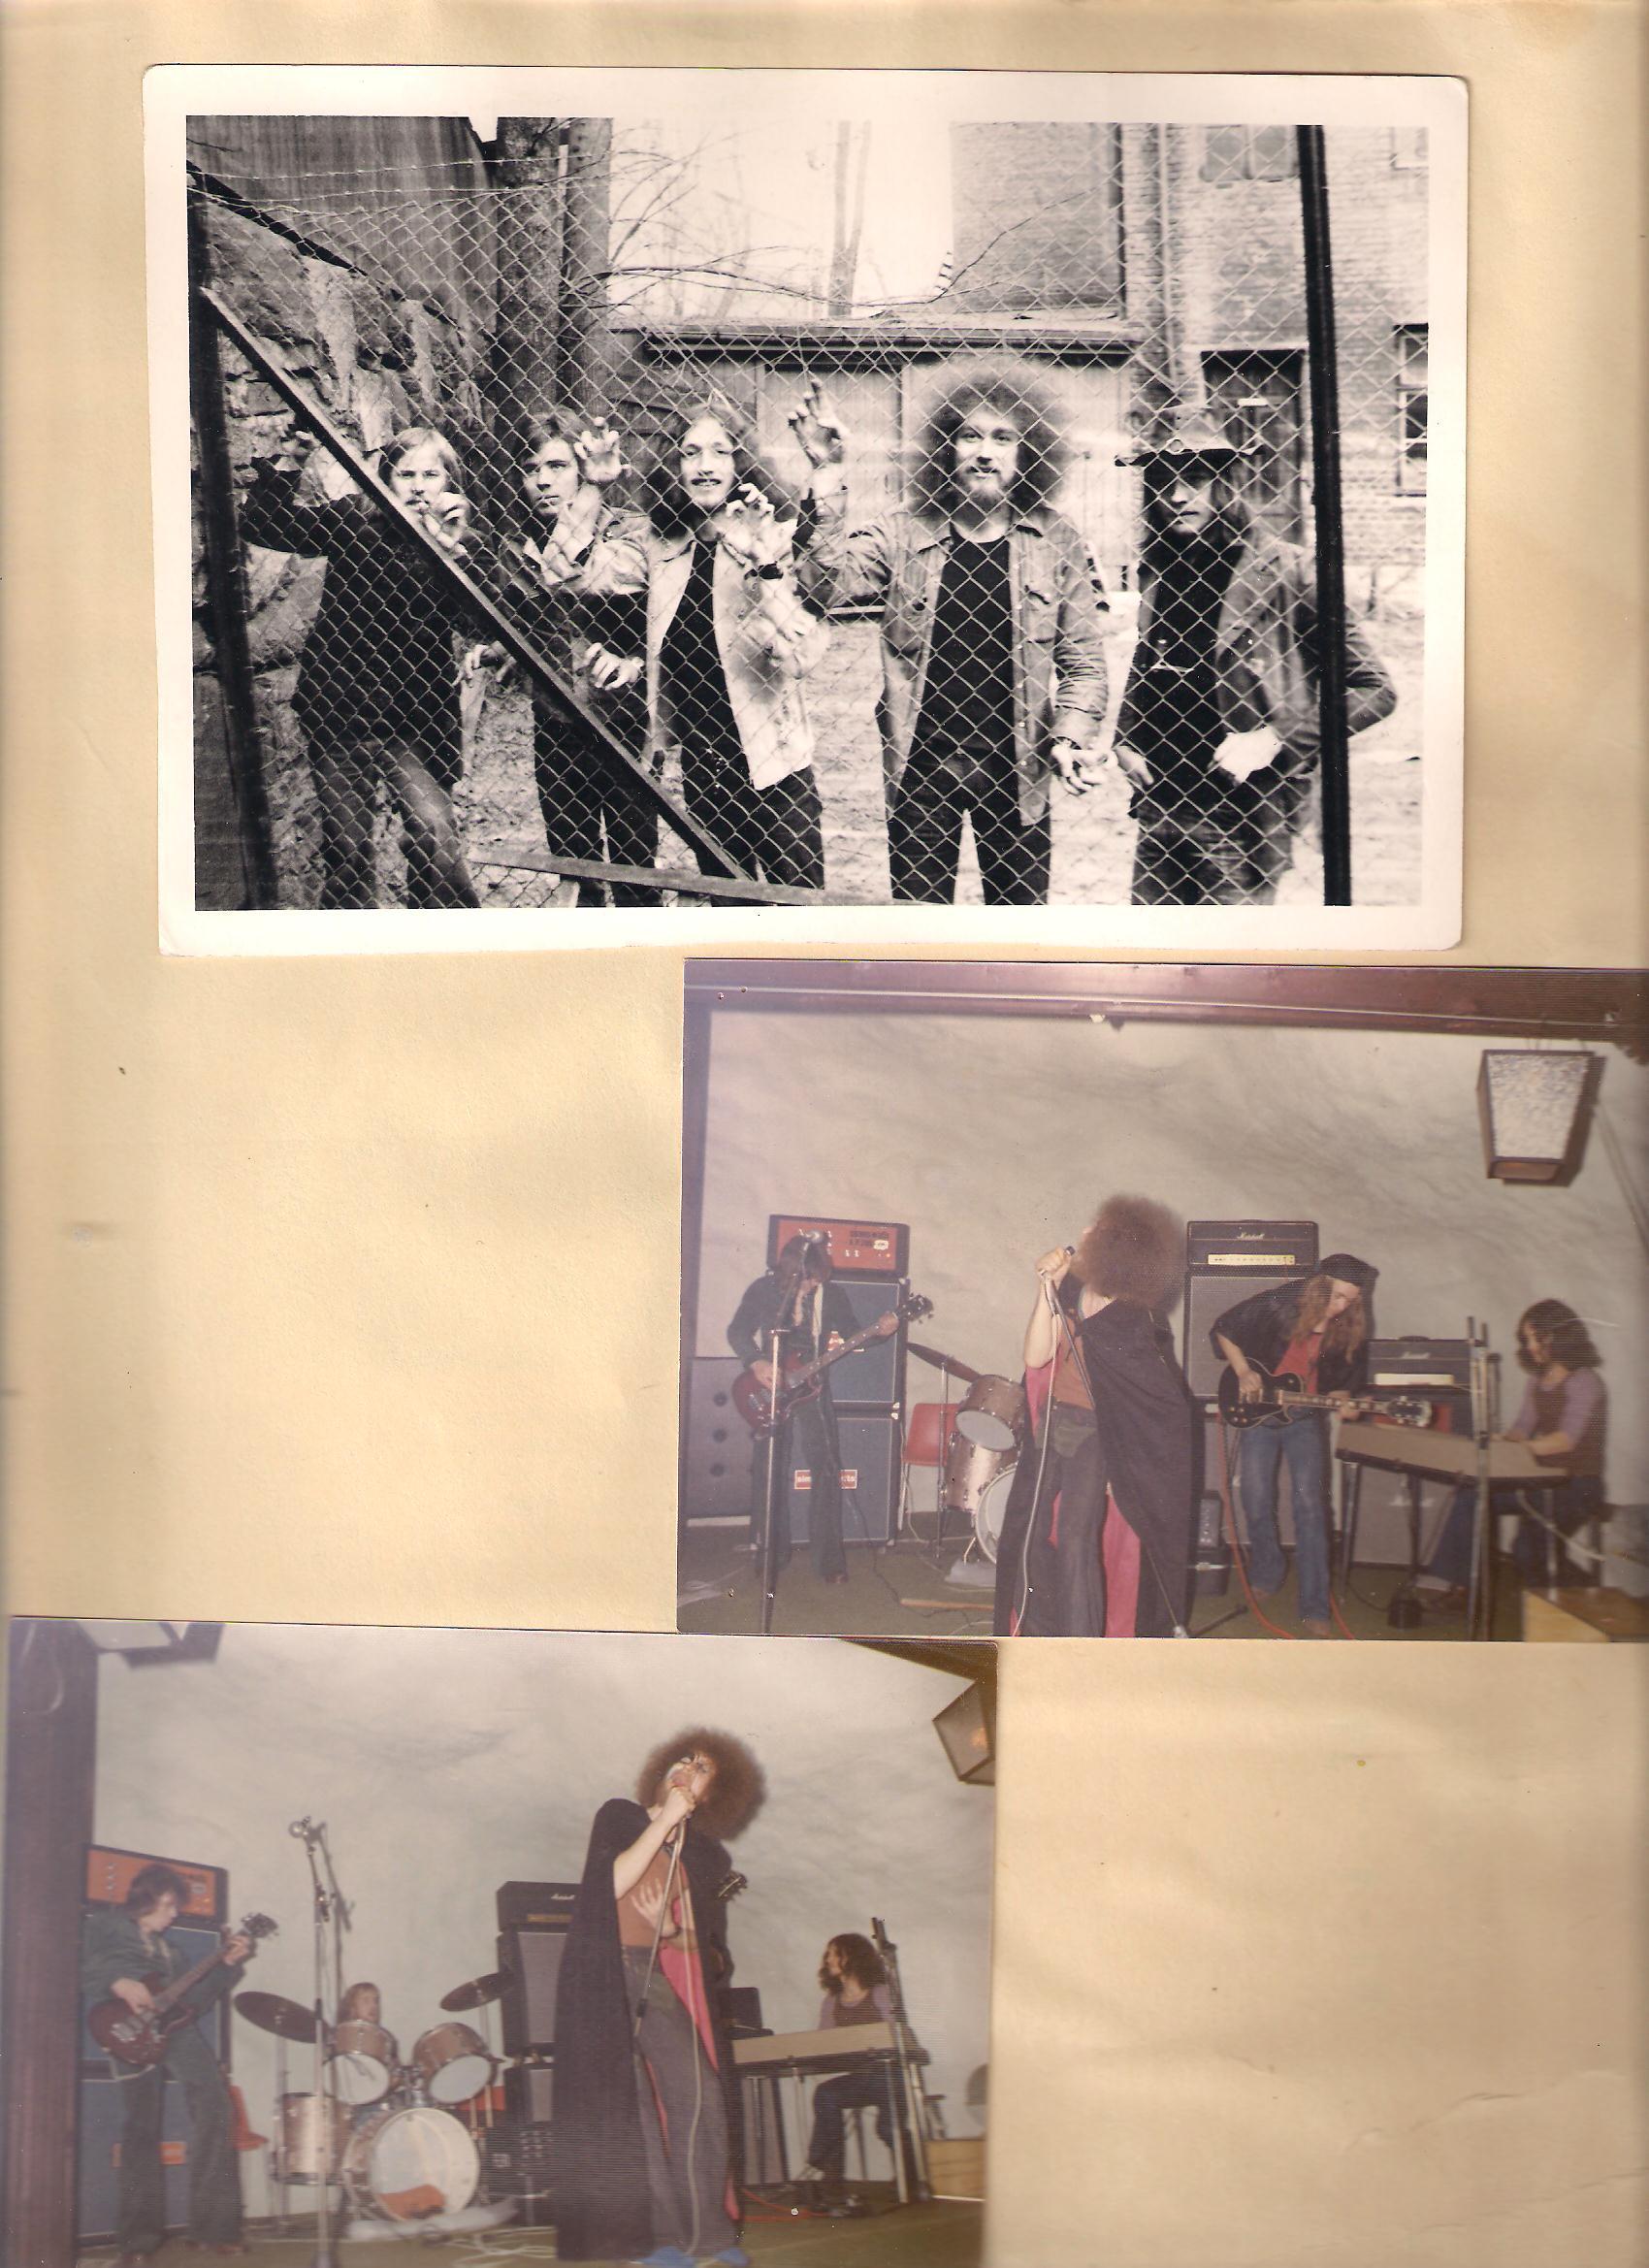 Flax 1974